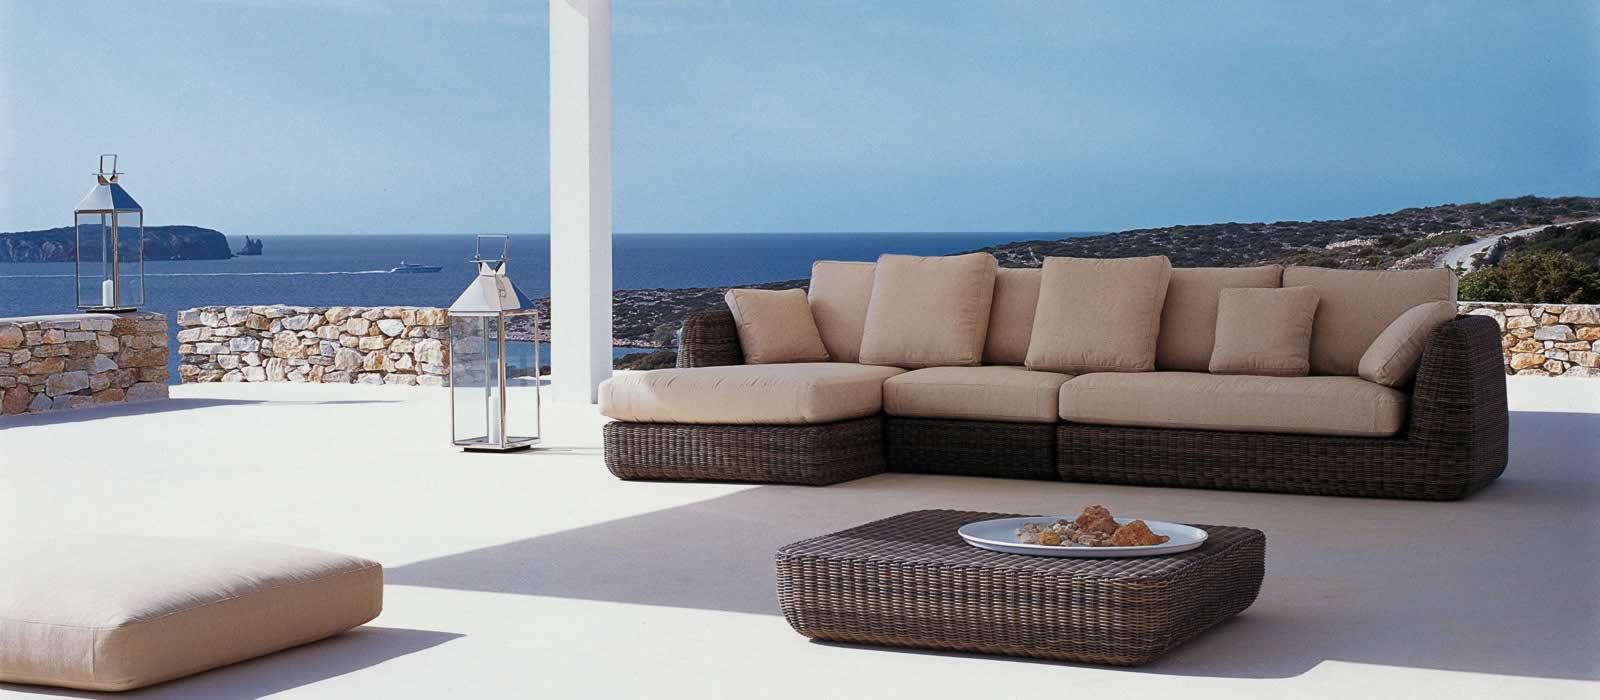 mobili giardino a Salerno da Montella Prisma Arredo